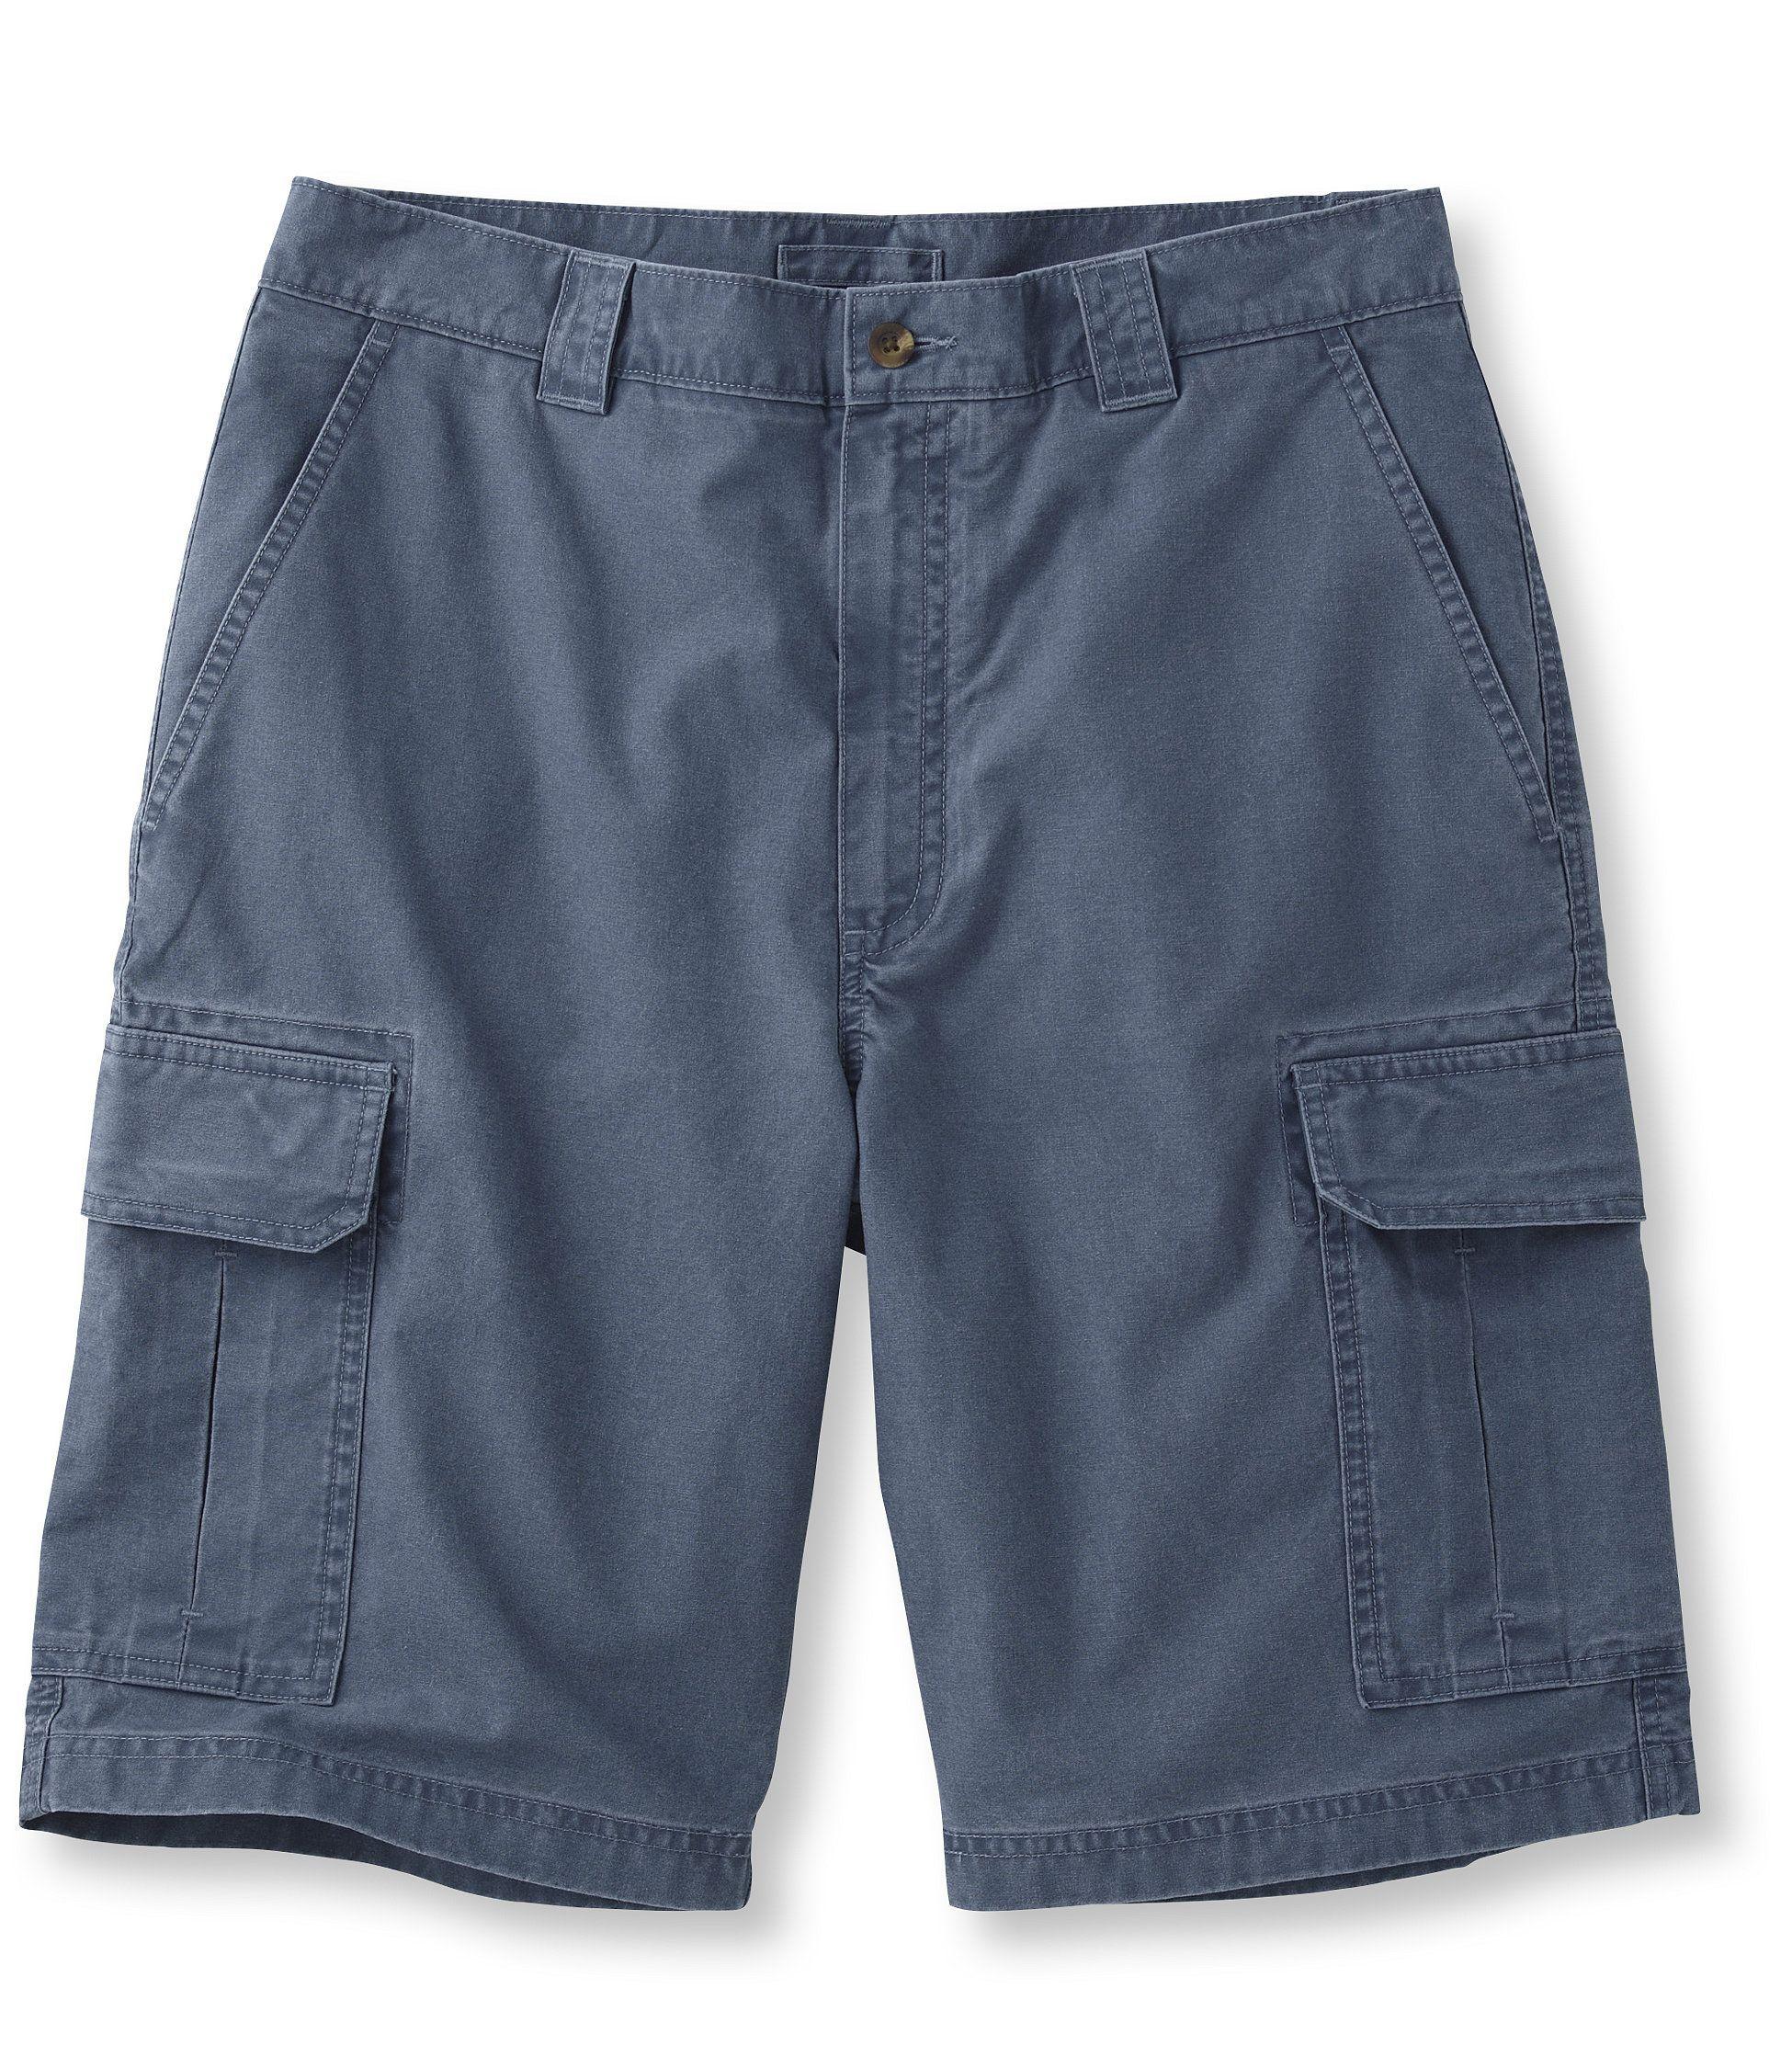 8d57465c79 Men s Tropic-Weight Cargo Shorts